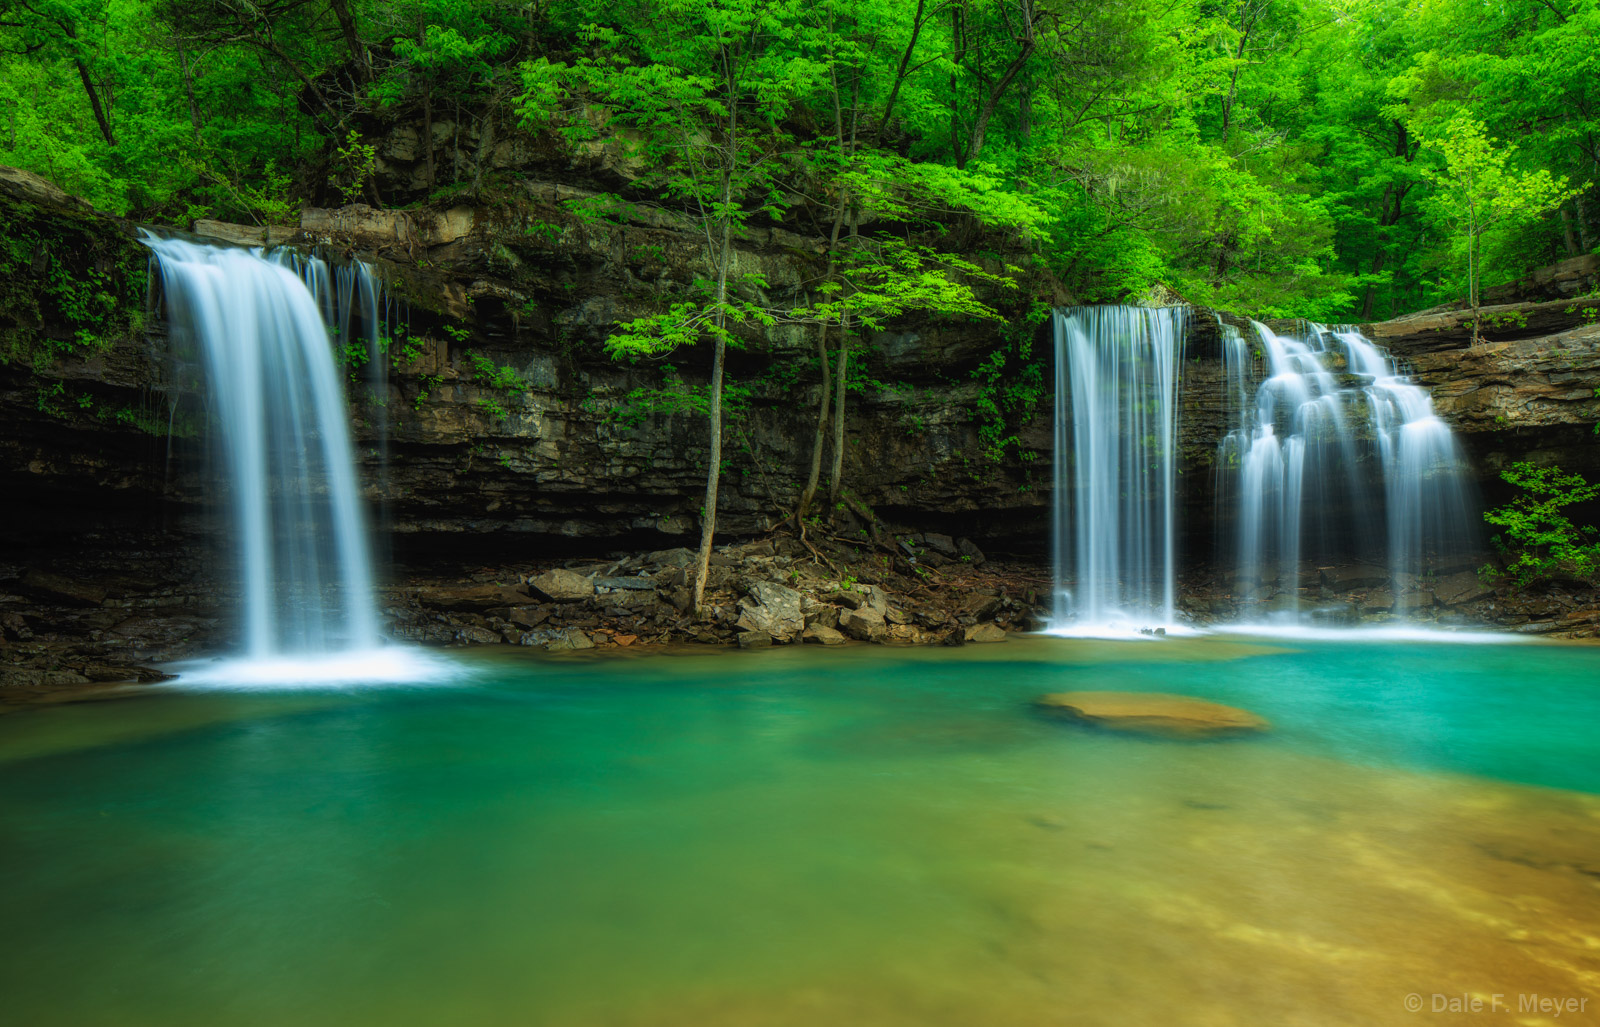 Richland Creek Arkansas, Spring 2016, Twin Falls